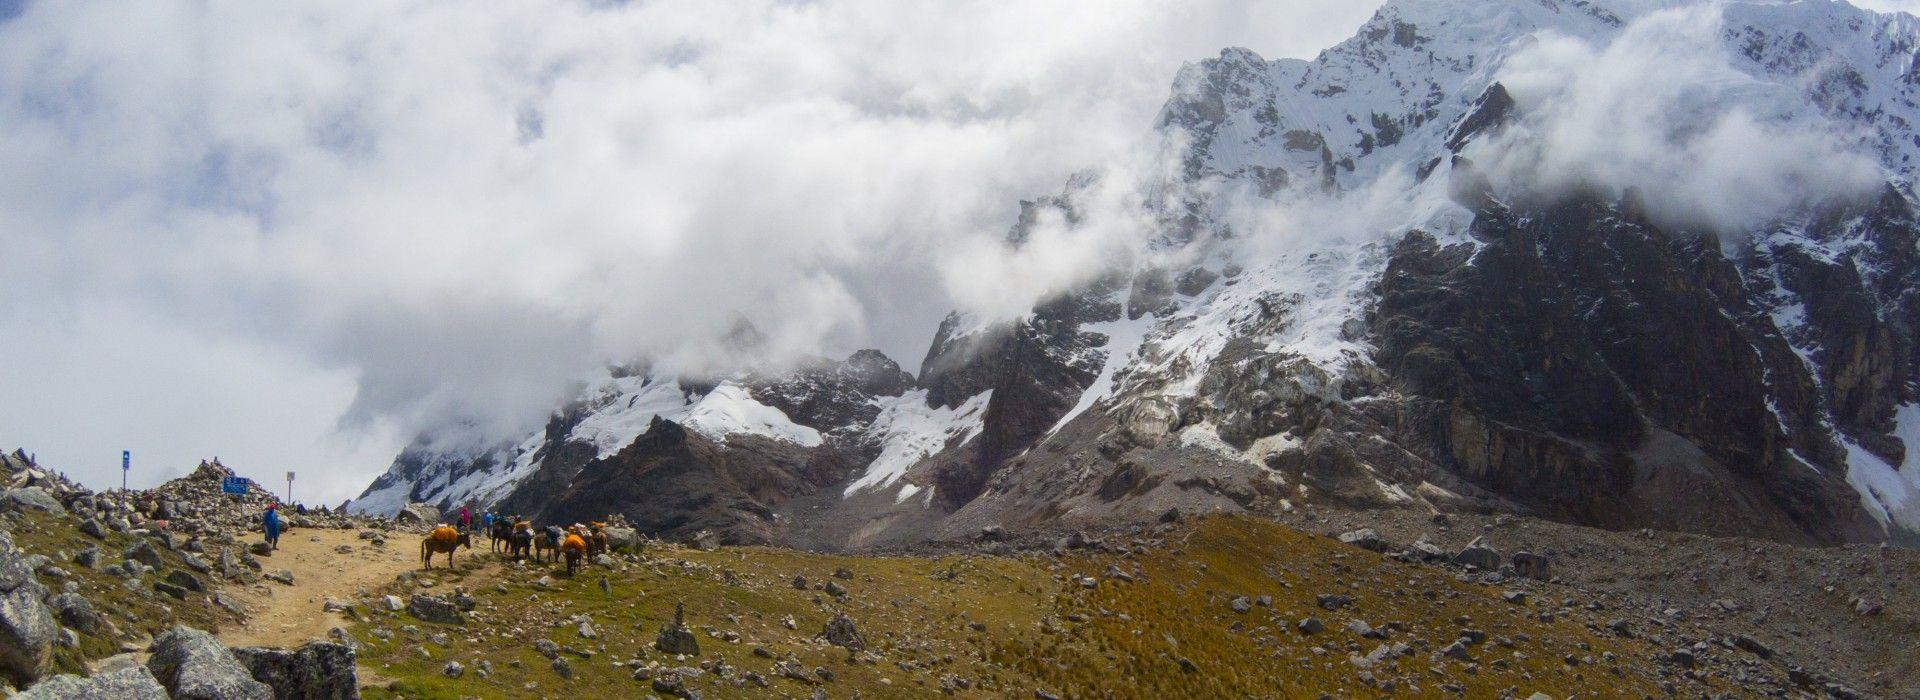 Rafting Tours in Cusco